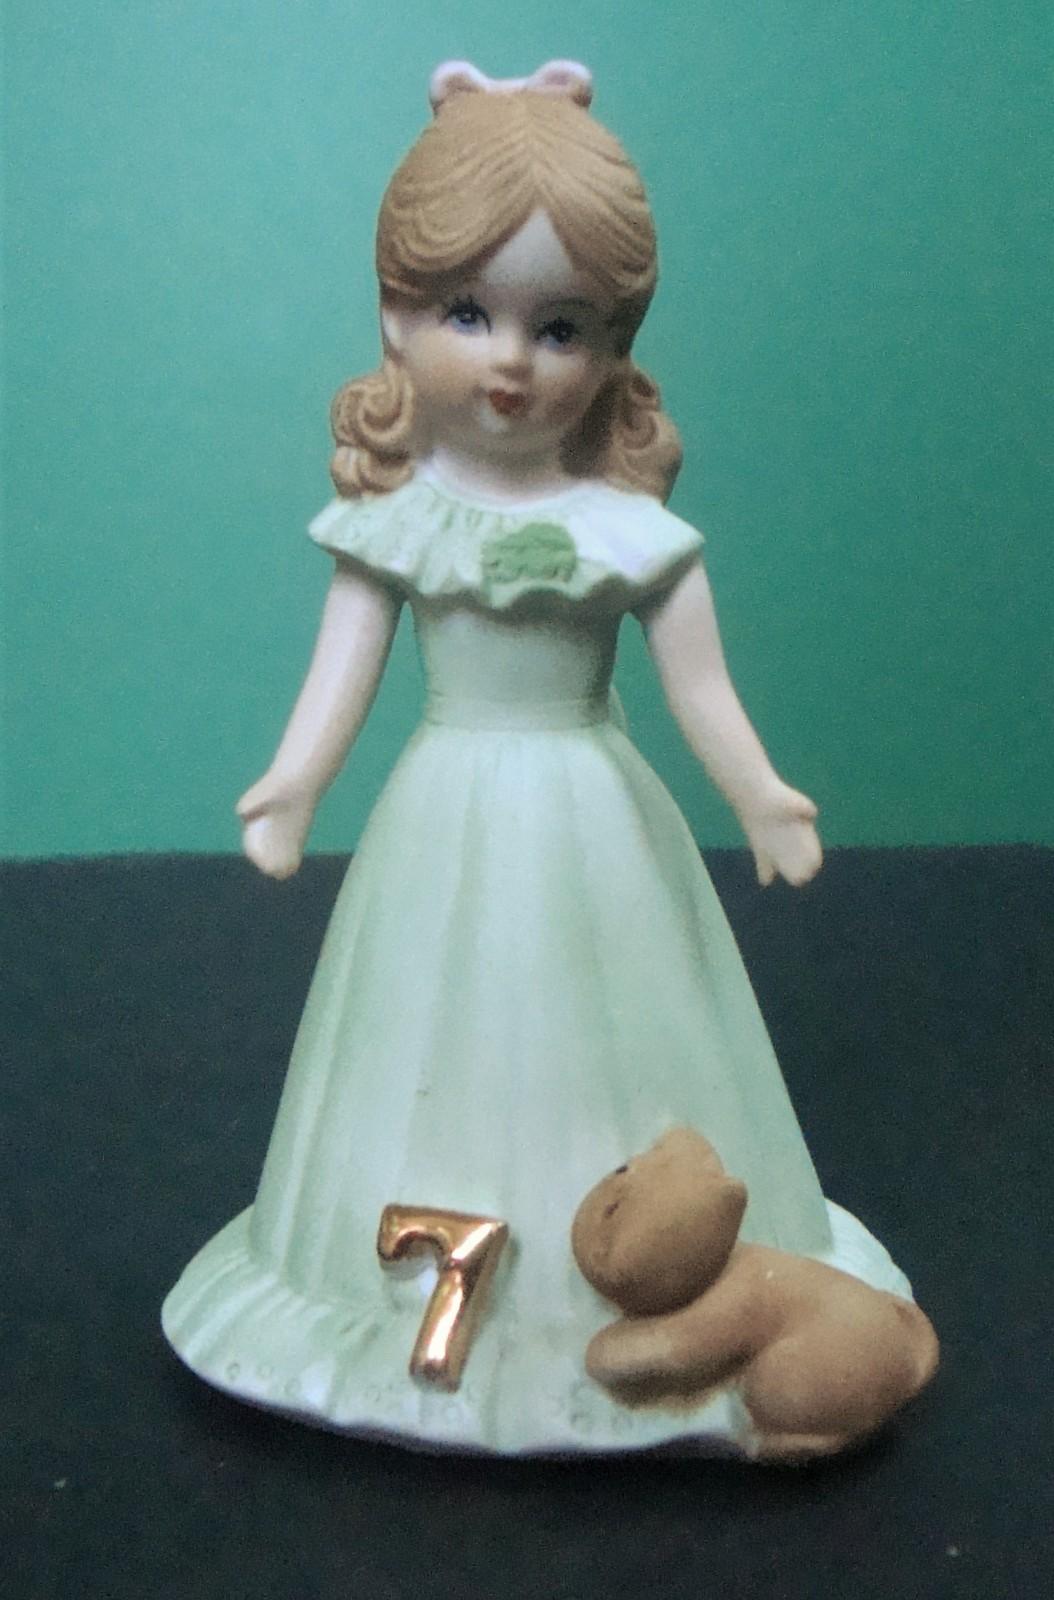 Enesco Growing Up Birthday Girls Age 7, No Box - $6.99